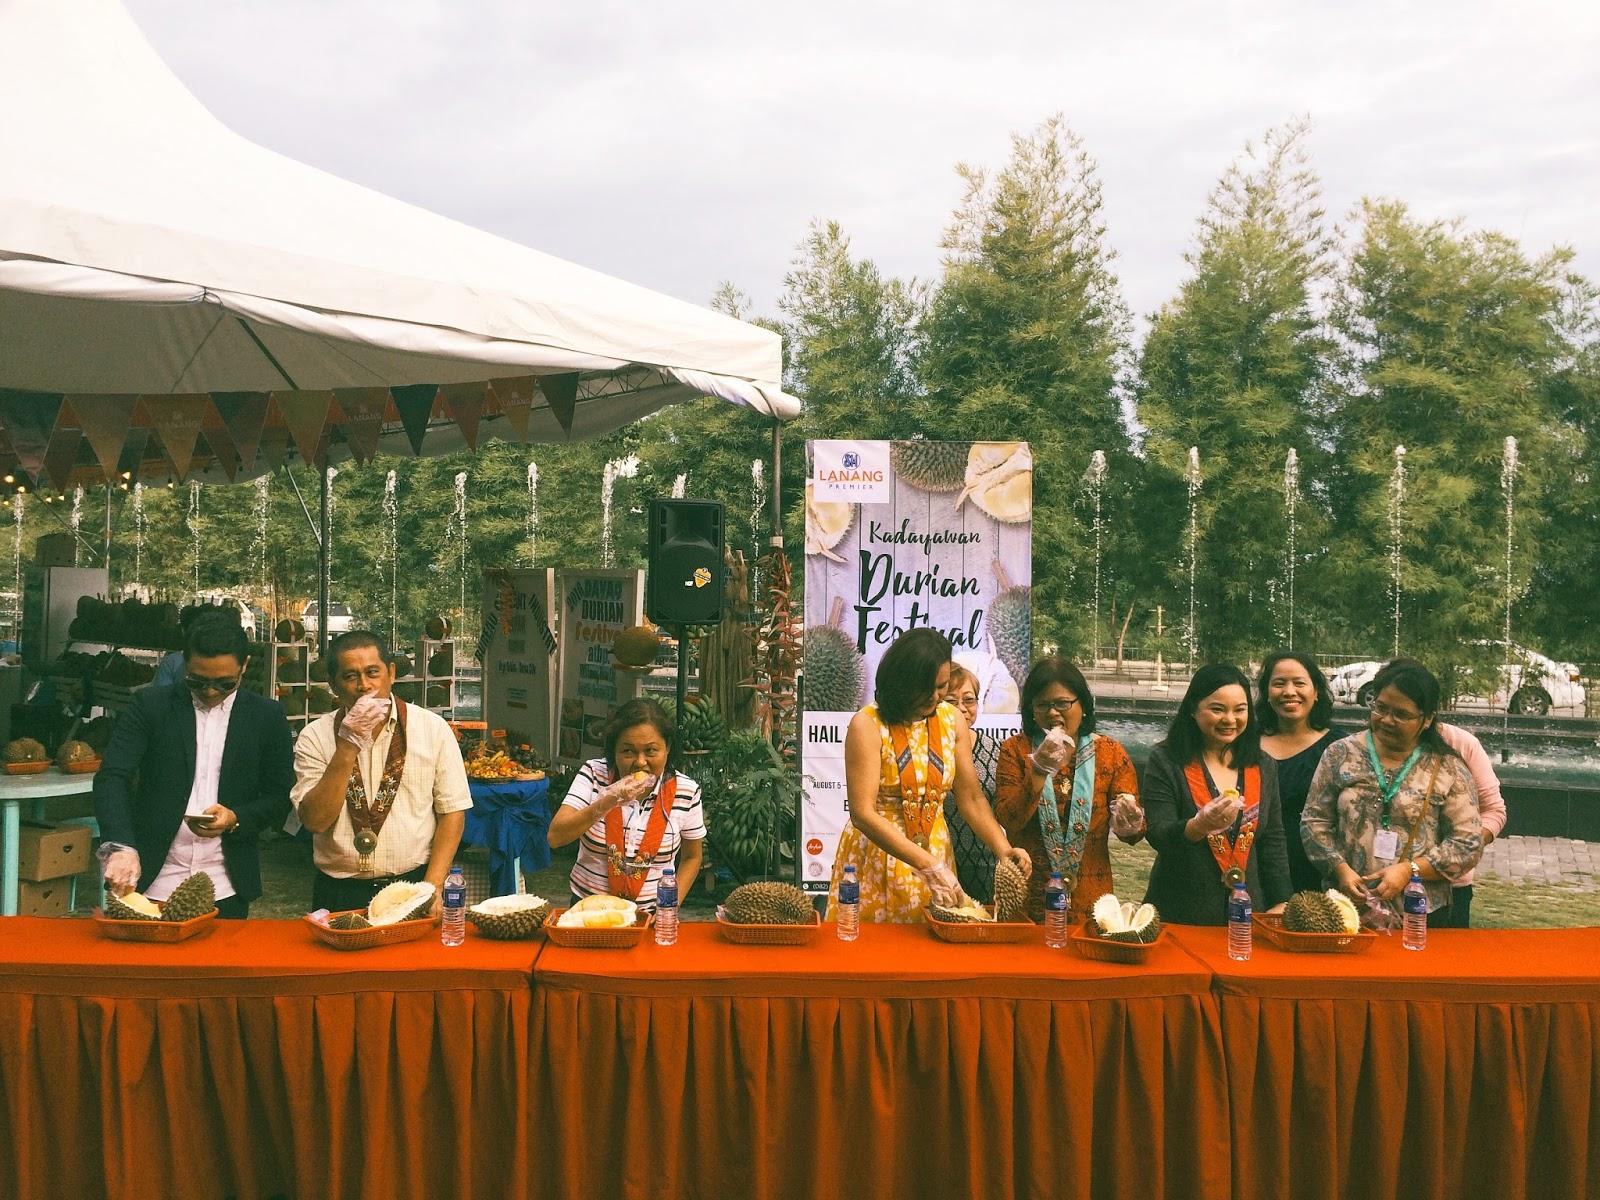 sm lanang premier kadayawan durian festival 2016